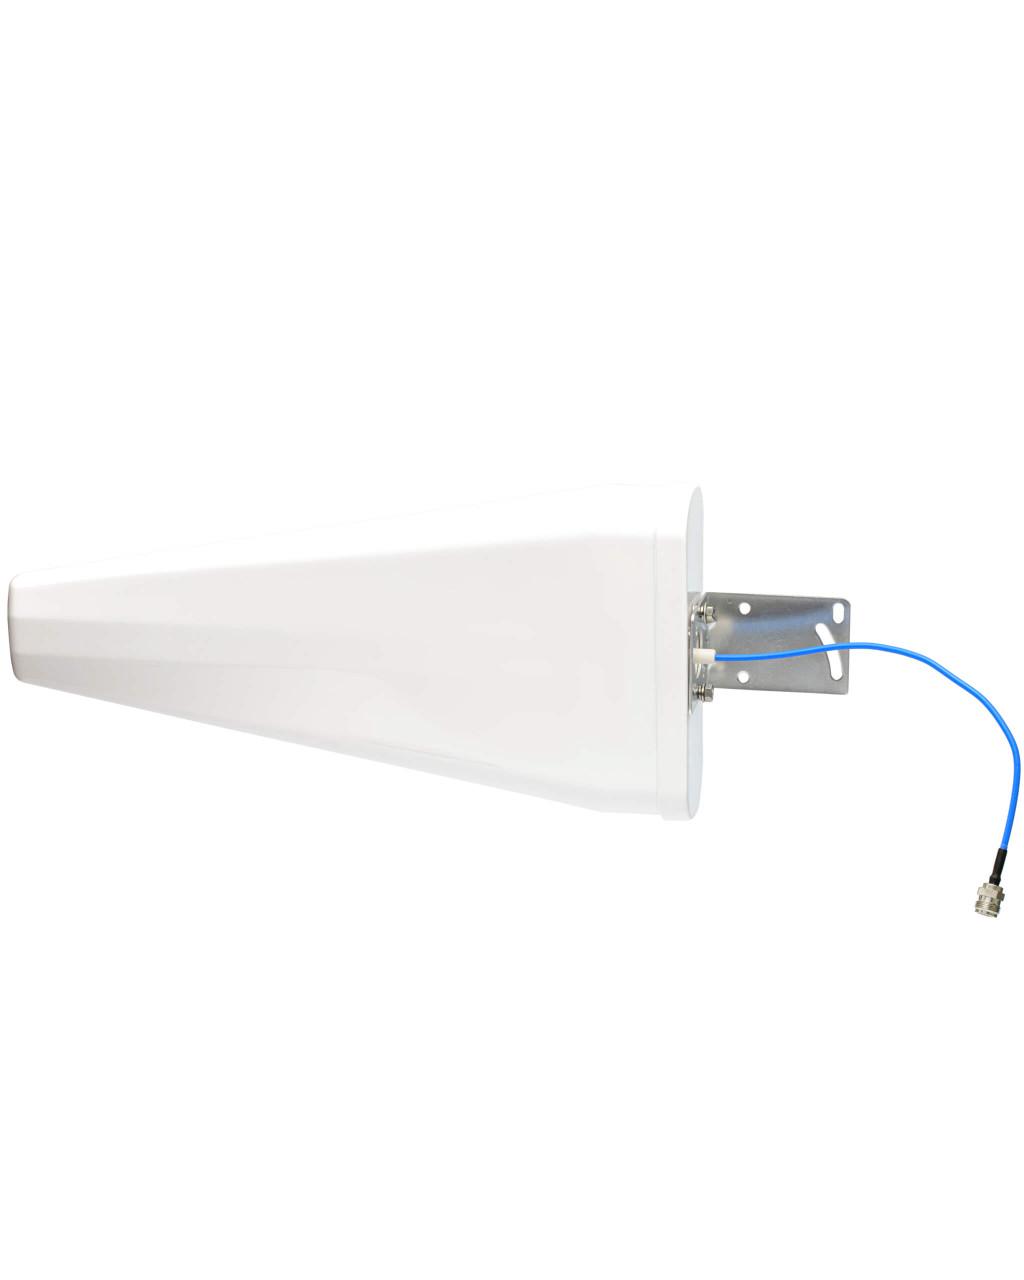 The Quicksilver Yagi Directional Antenna side angle